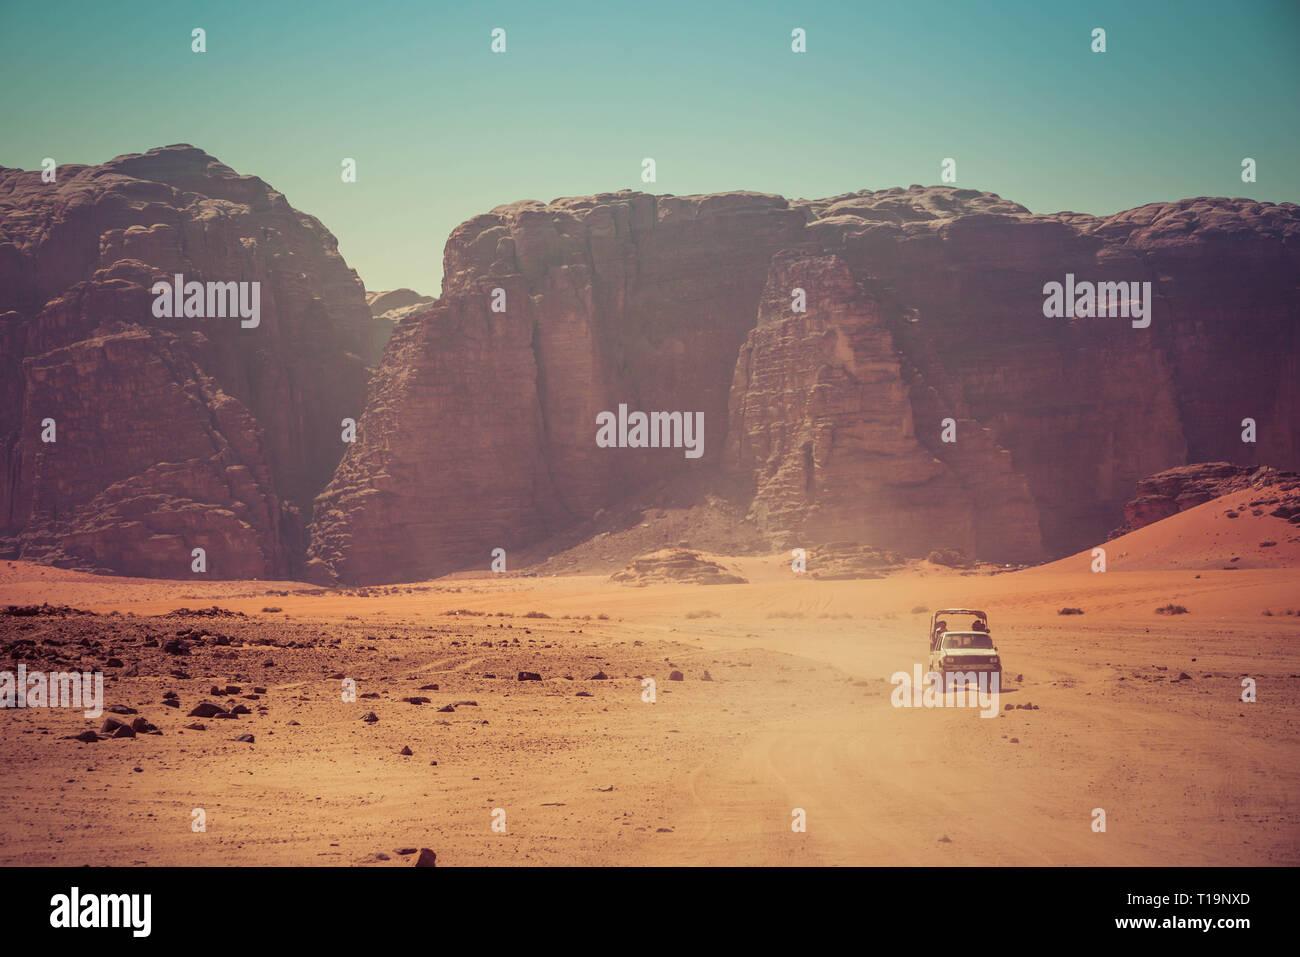 Wadi Rum desert, Kingdom of Jordan Stock Photo